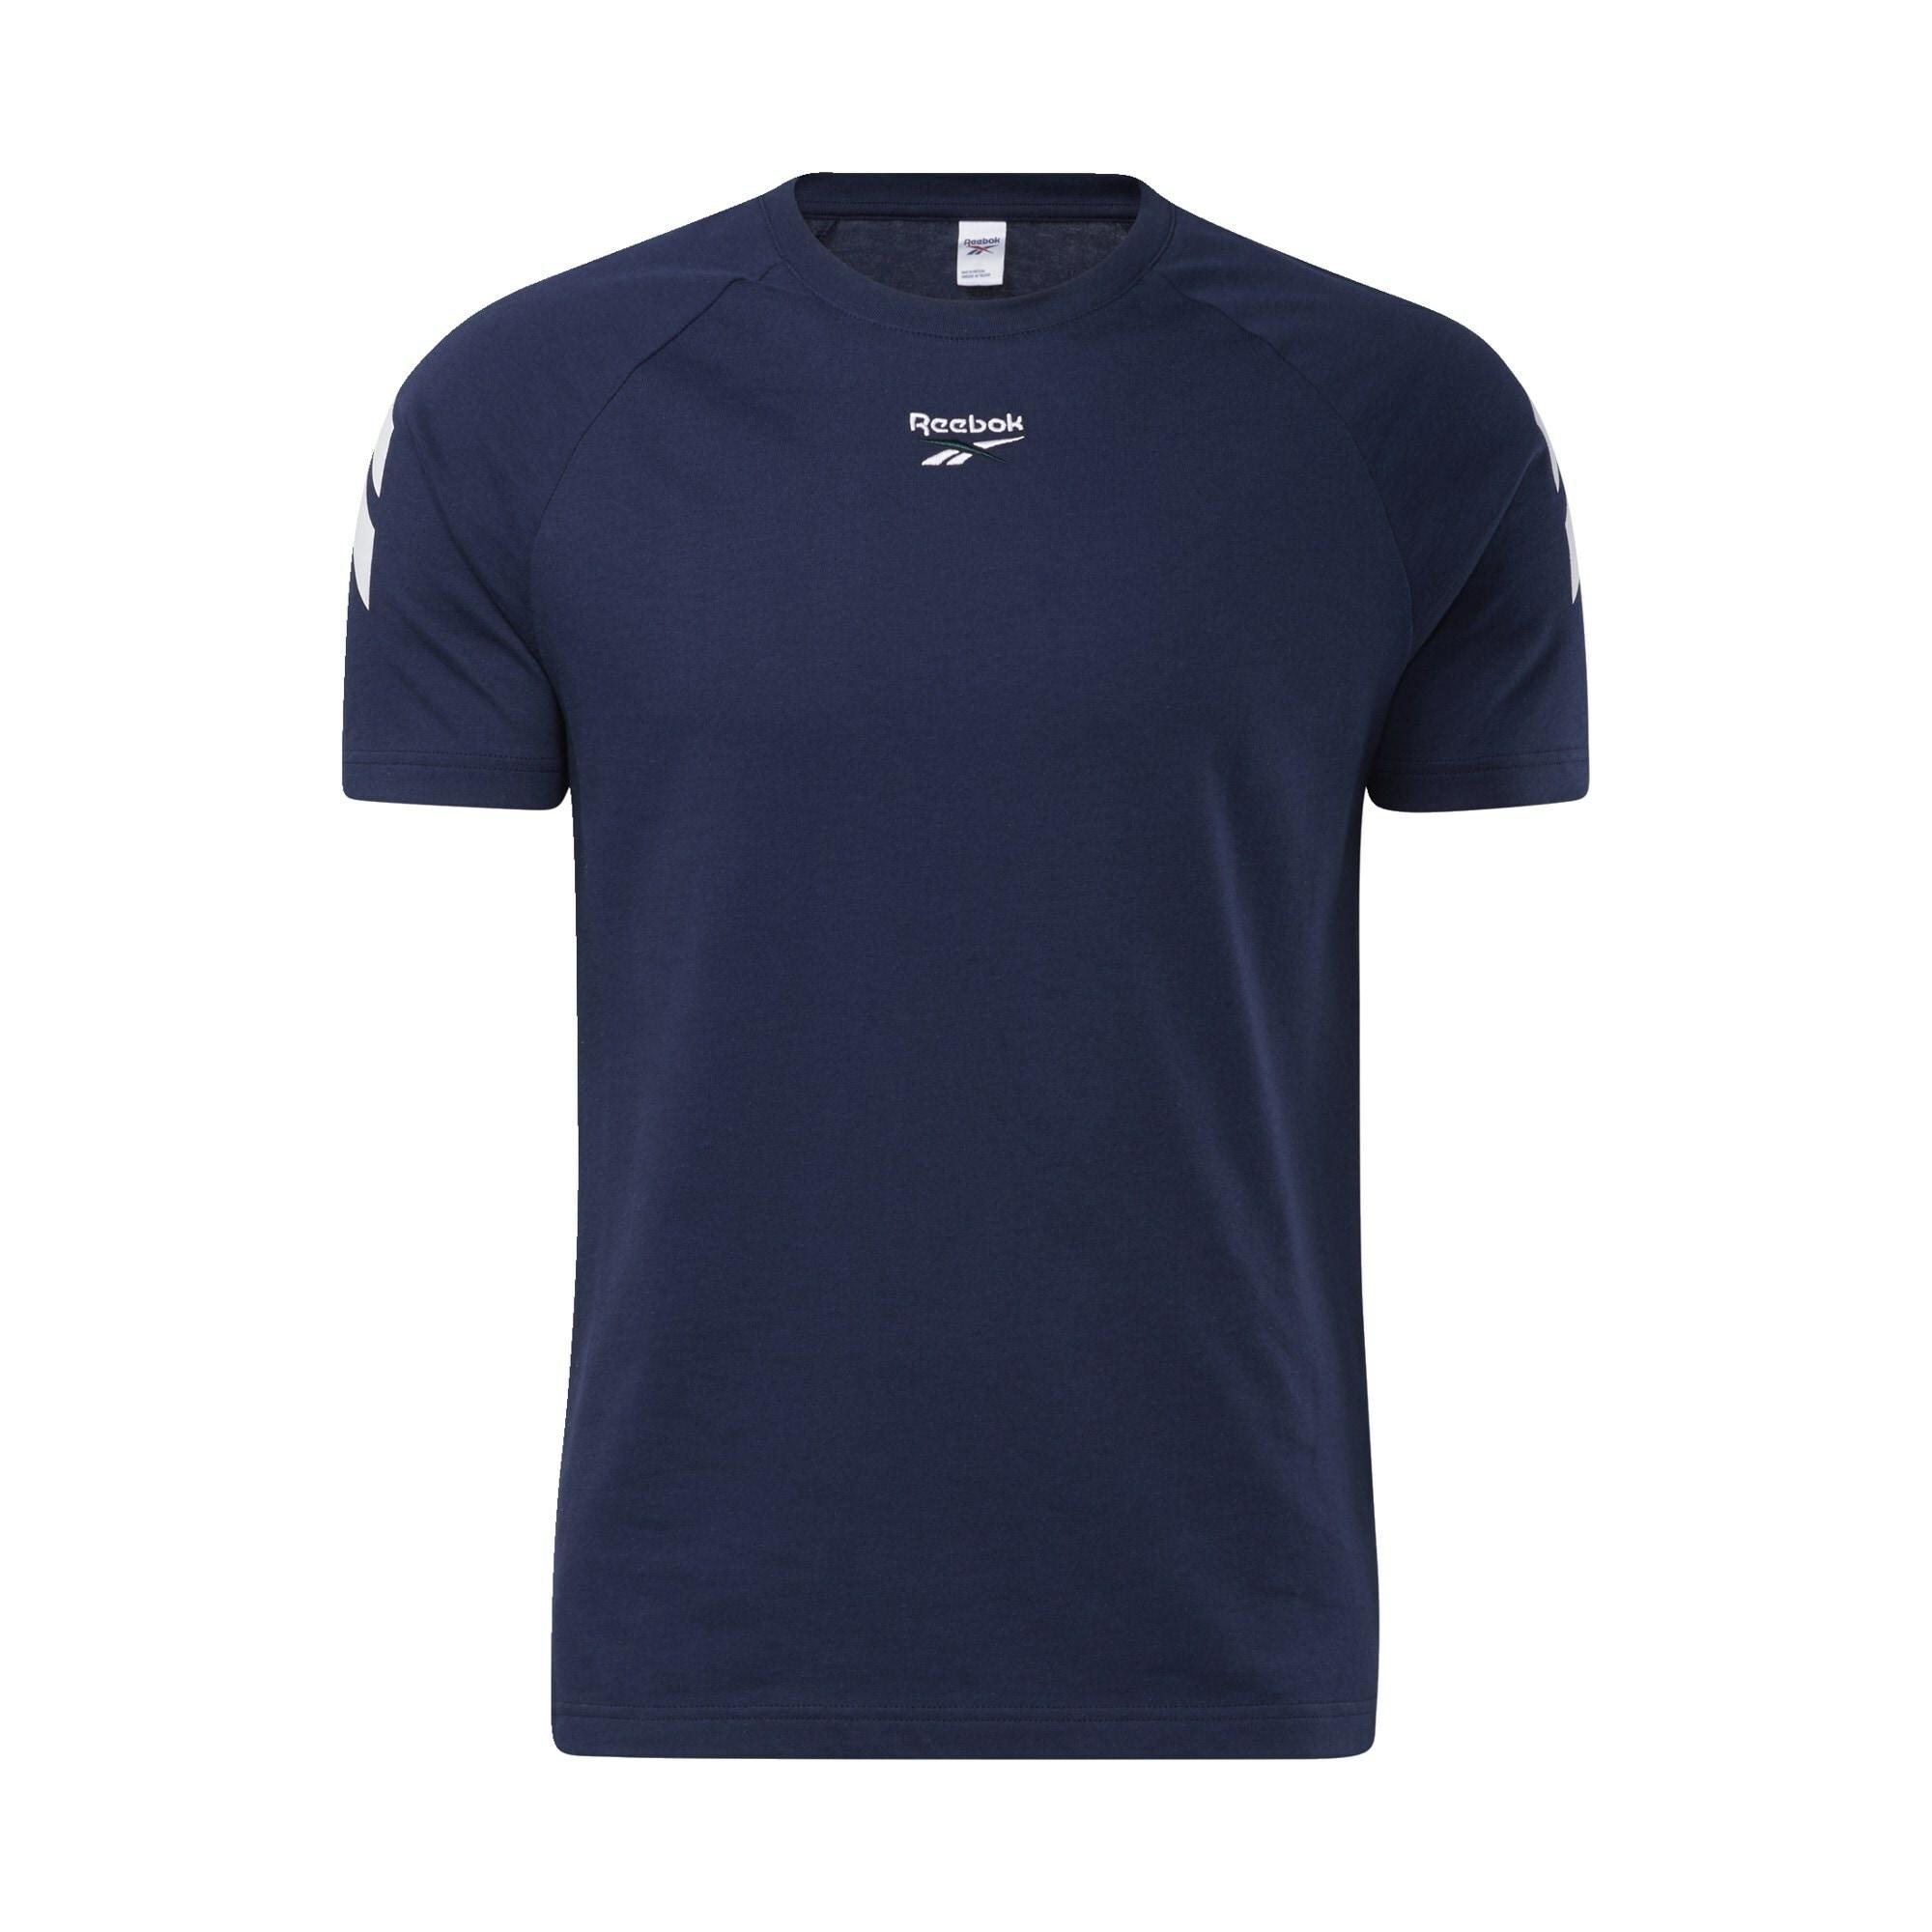 Reebok Classic Marškinėliai mėlyna